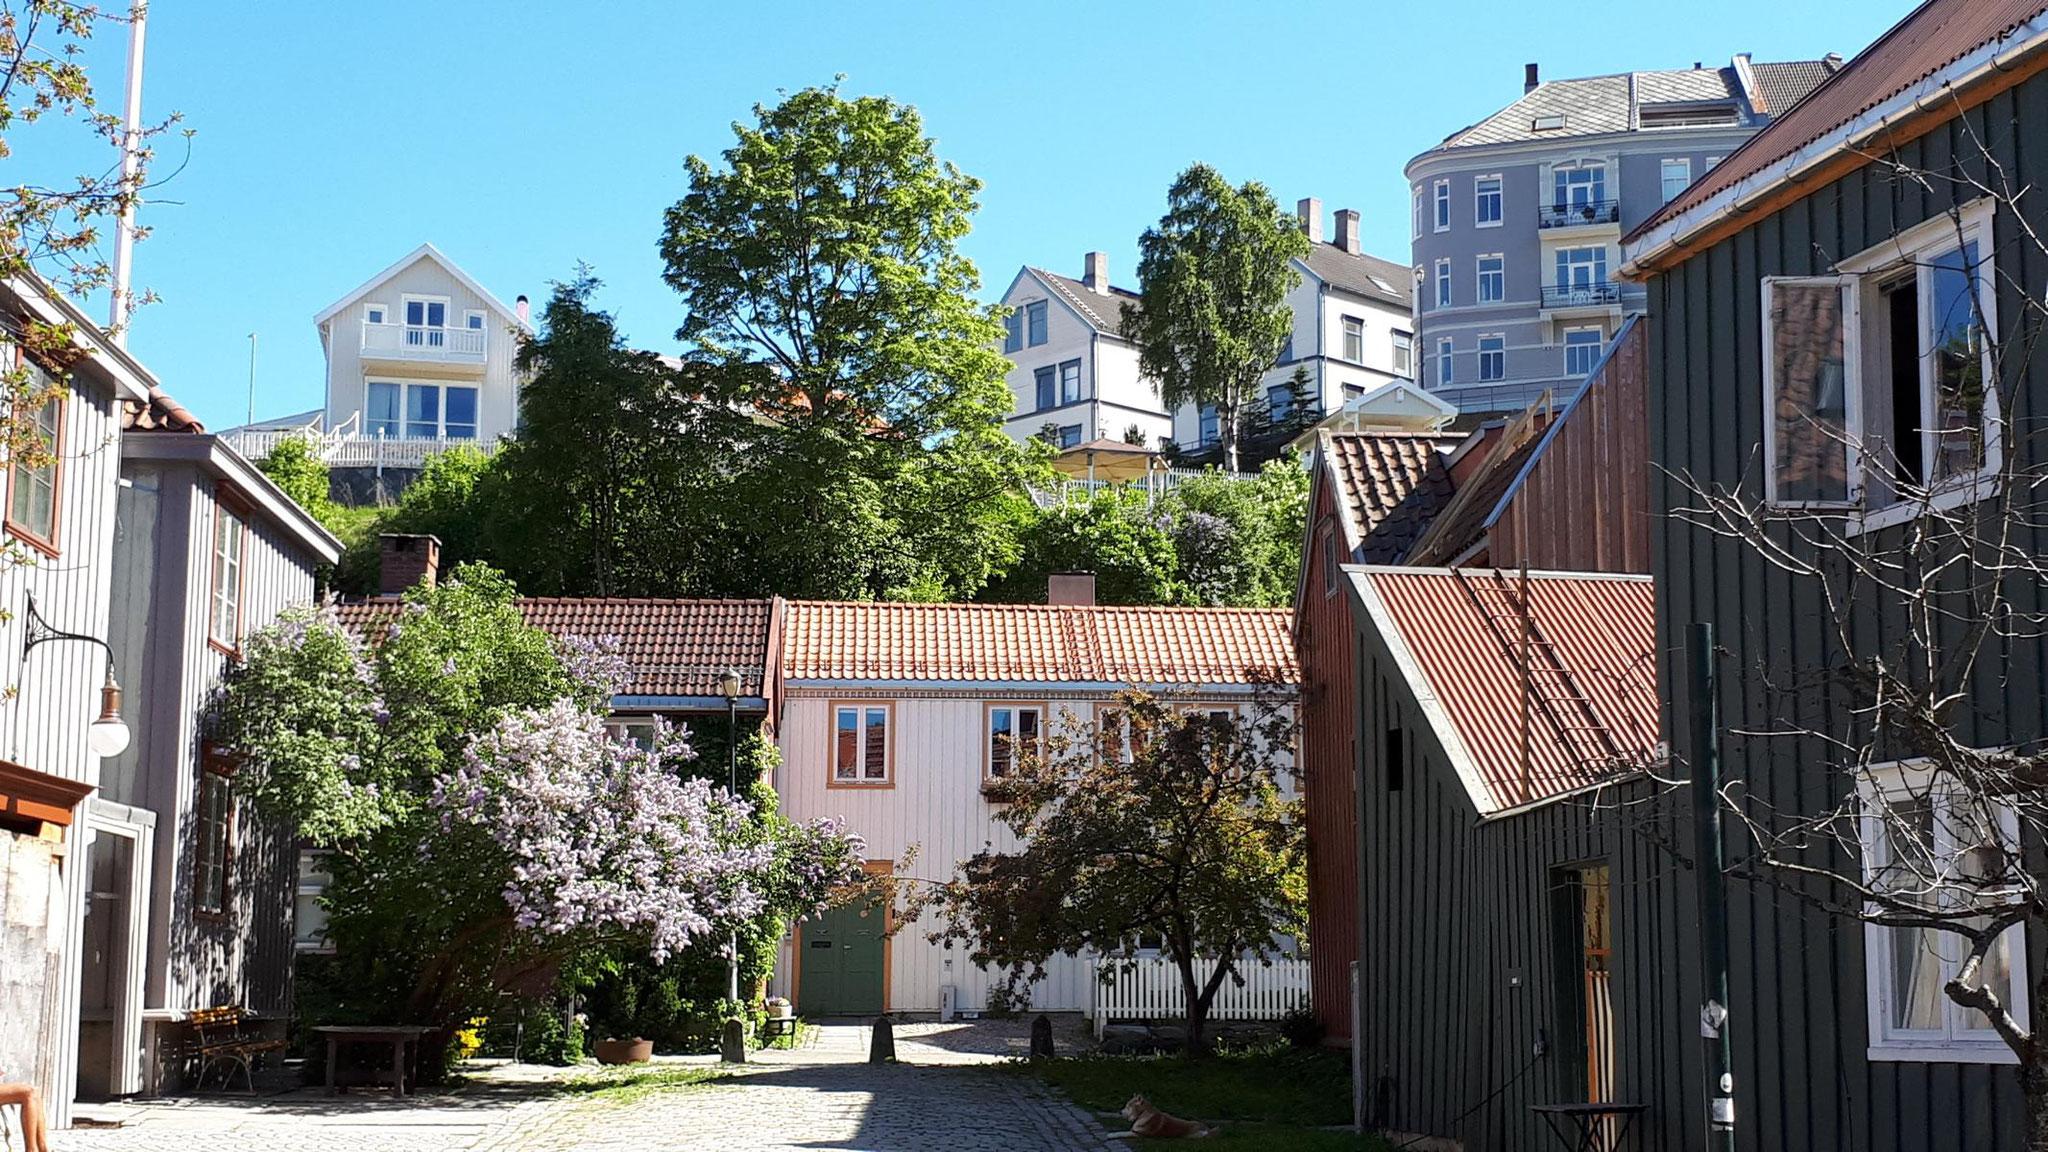 Altstadt Bakklandet